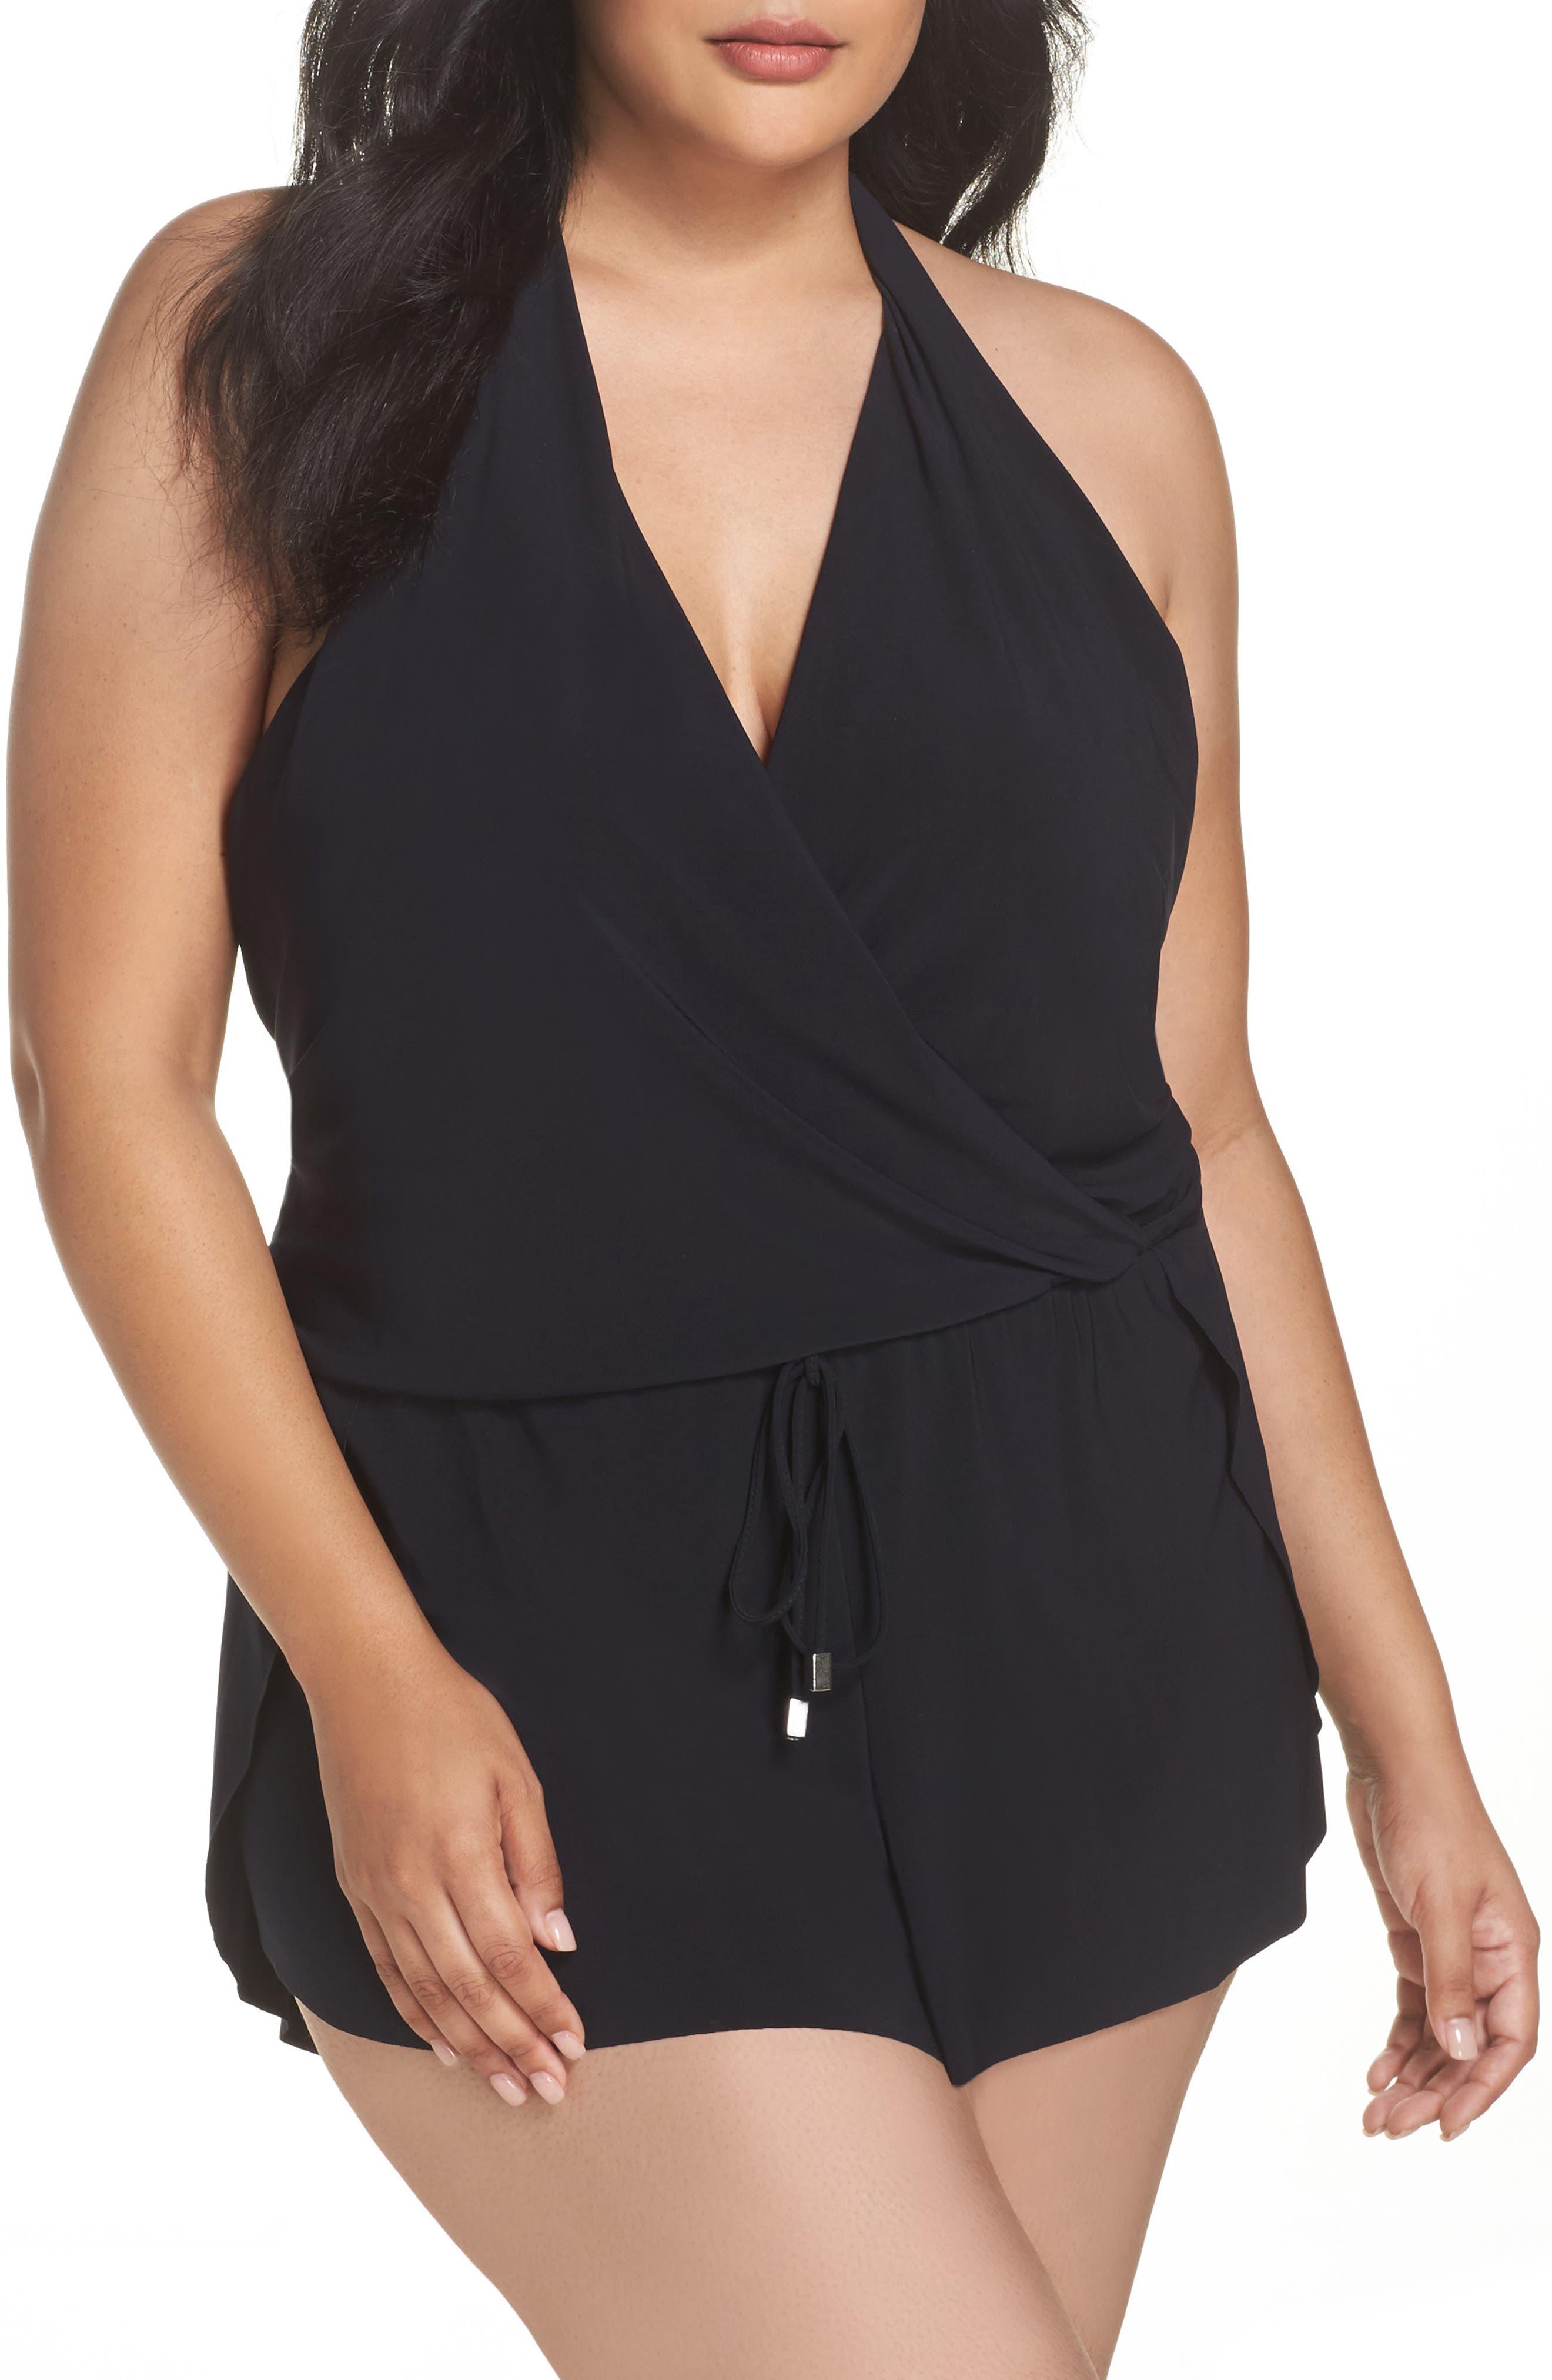 Bianca One-Piece Romper Swimsuit,                             Main thumbnail 1, color,                             Black